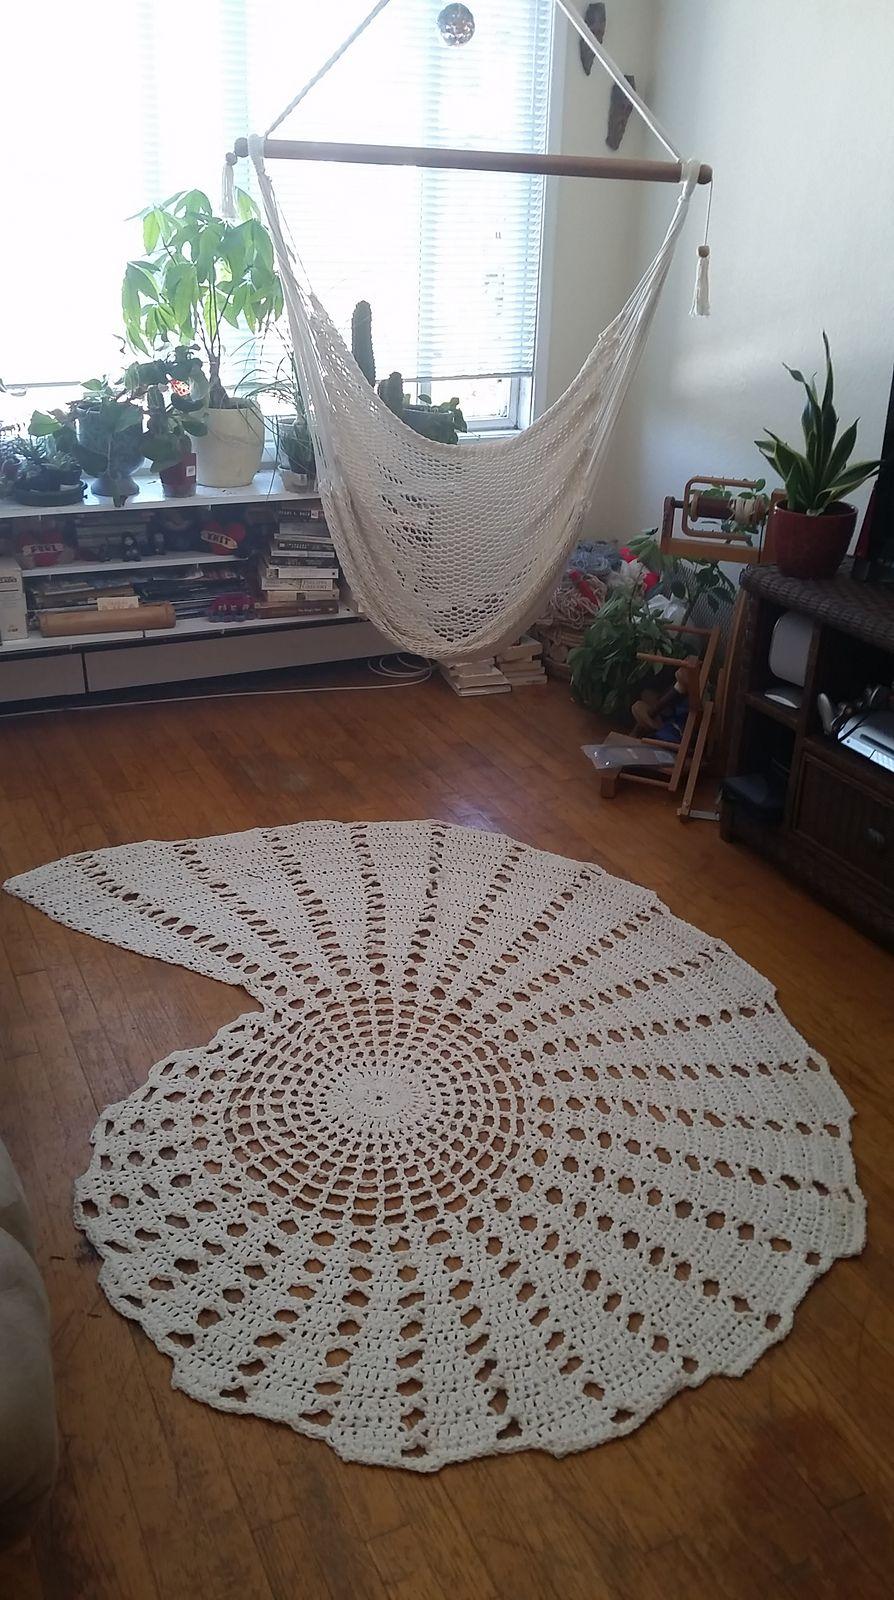 Ravelry: Seashell Carpet by Magic Carpet Studio | Babydecken ...